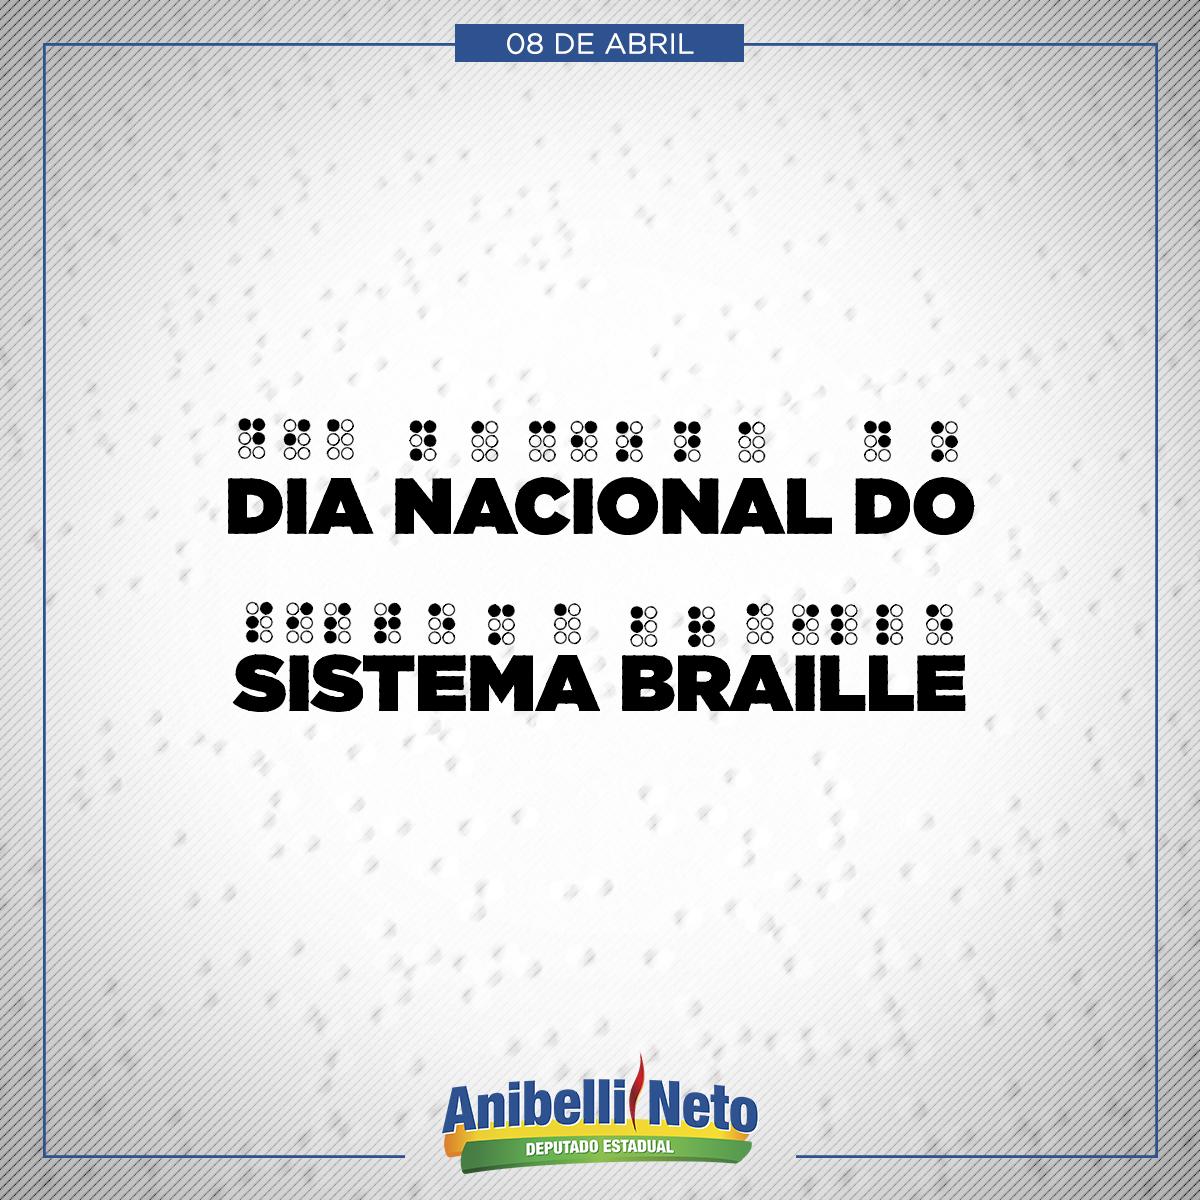 Dia Nacional do Sistema Braille